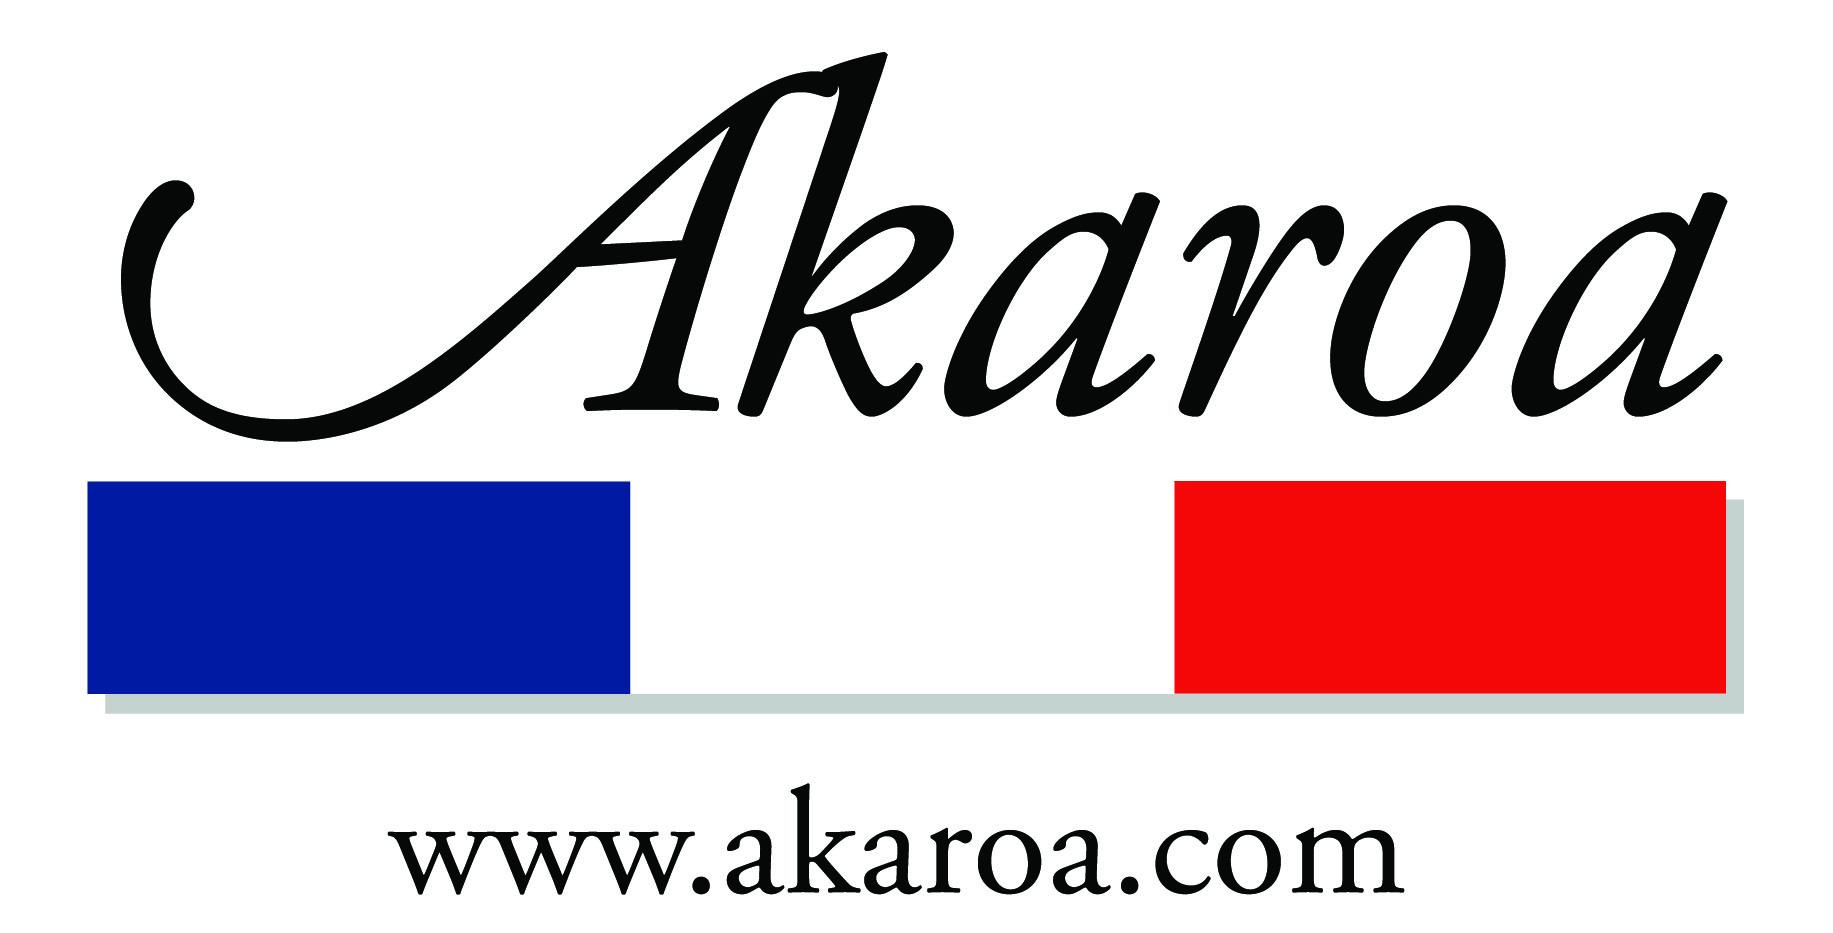 Akaroa-ADP-logo-web.jpg